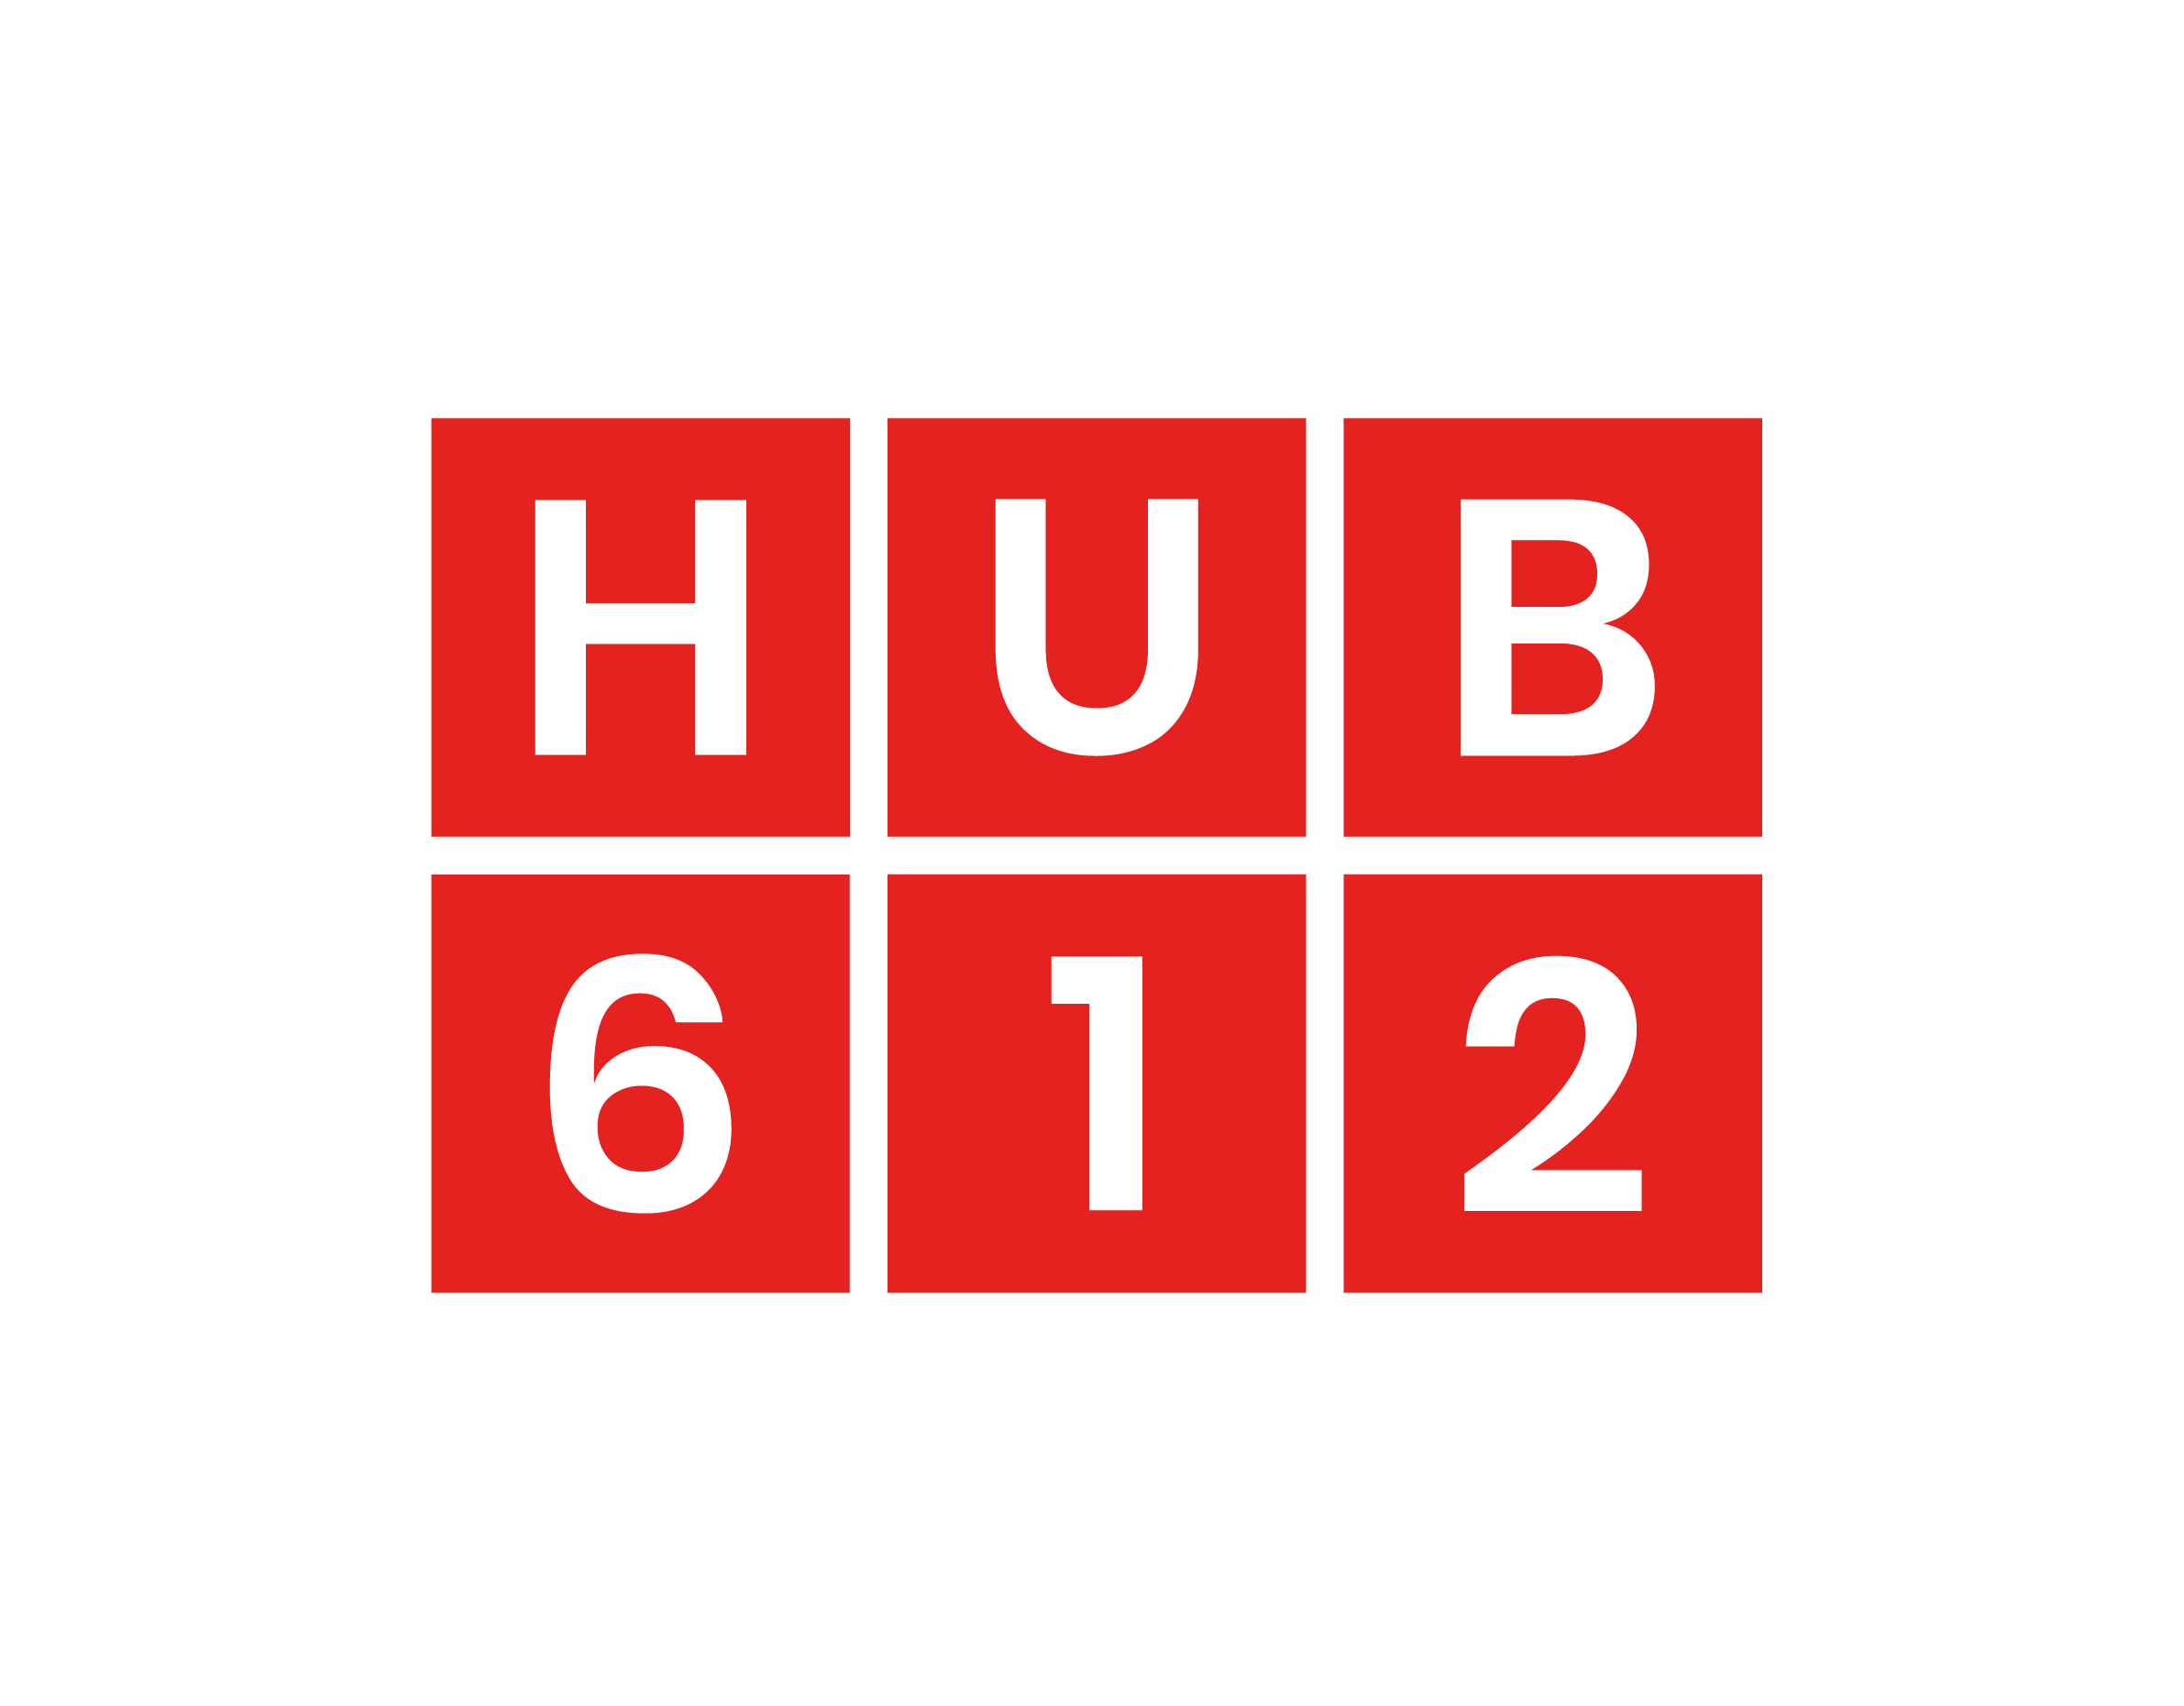 Logo HUB612